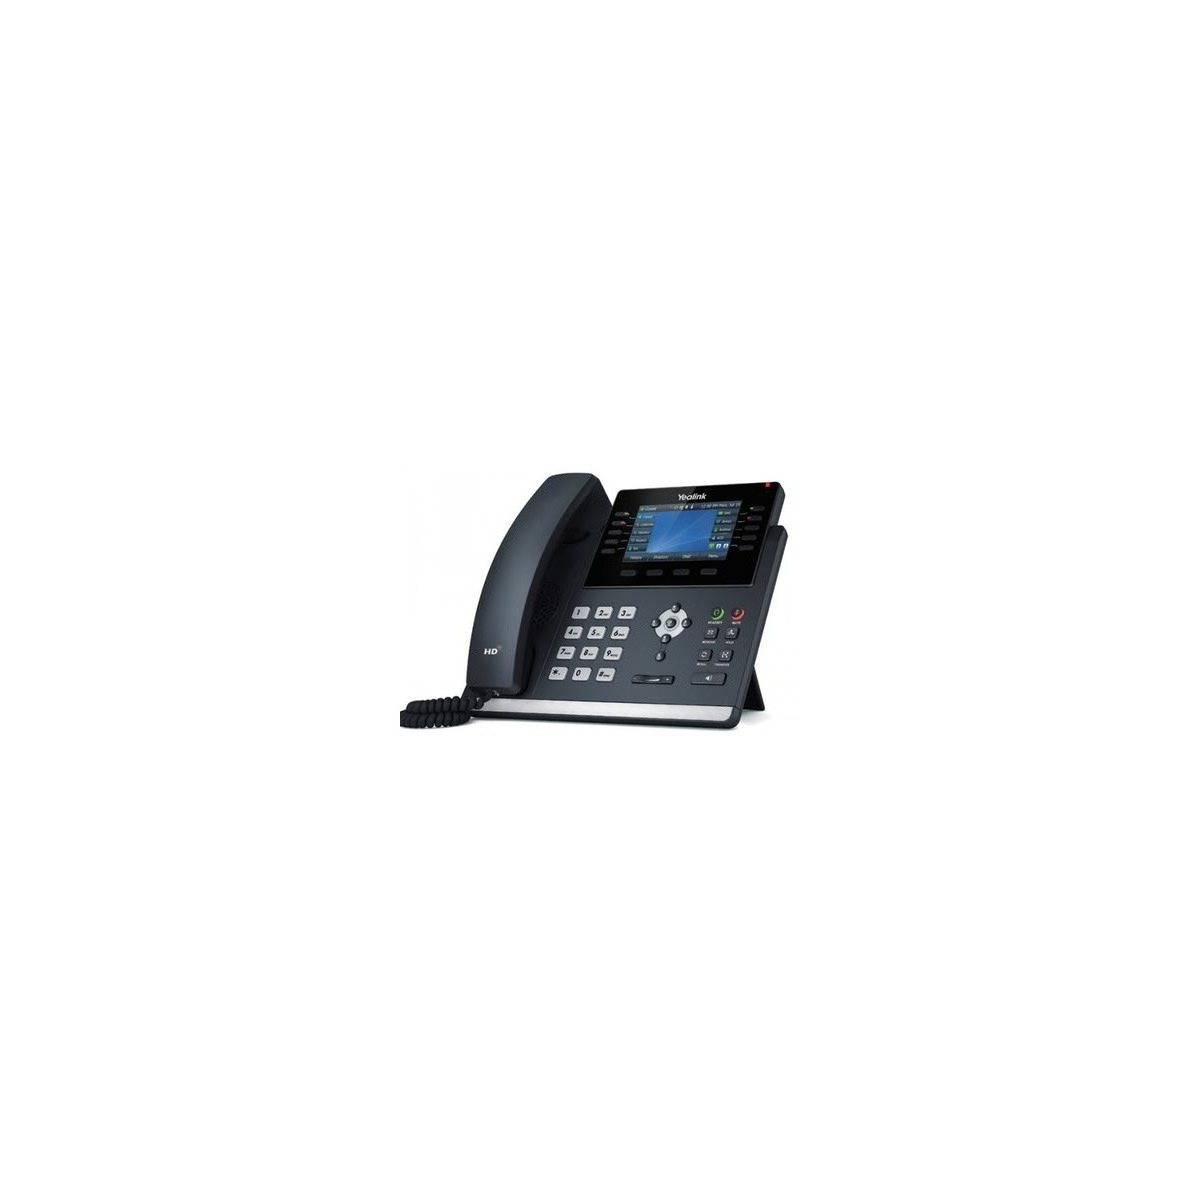 Yealink T46S Elegant Gigabit IP Phone